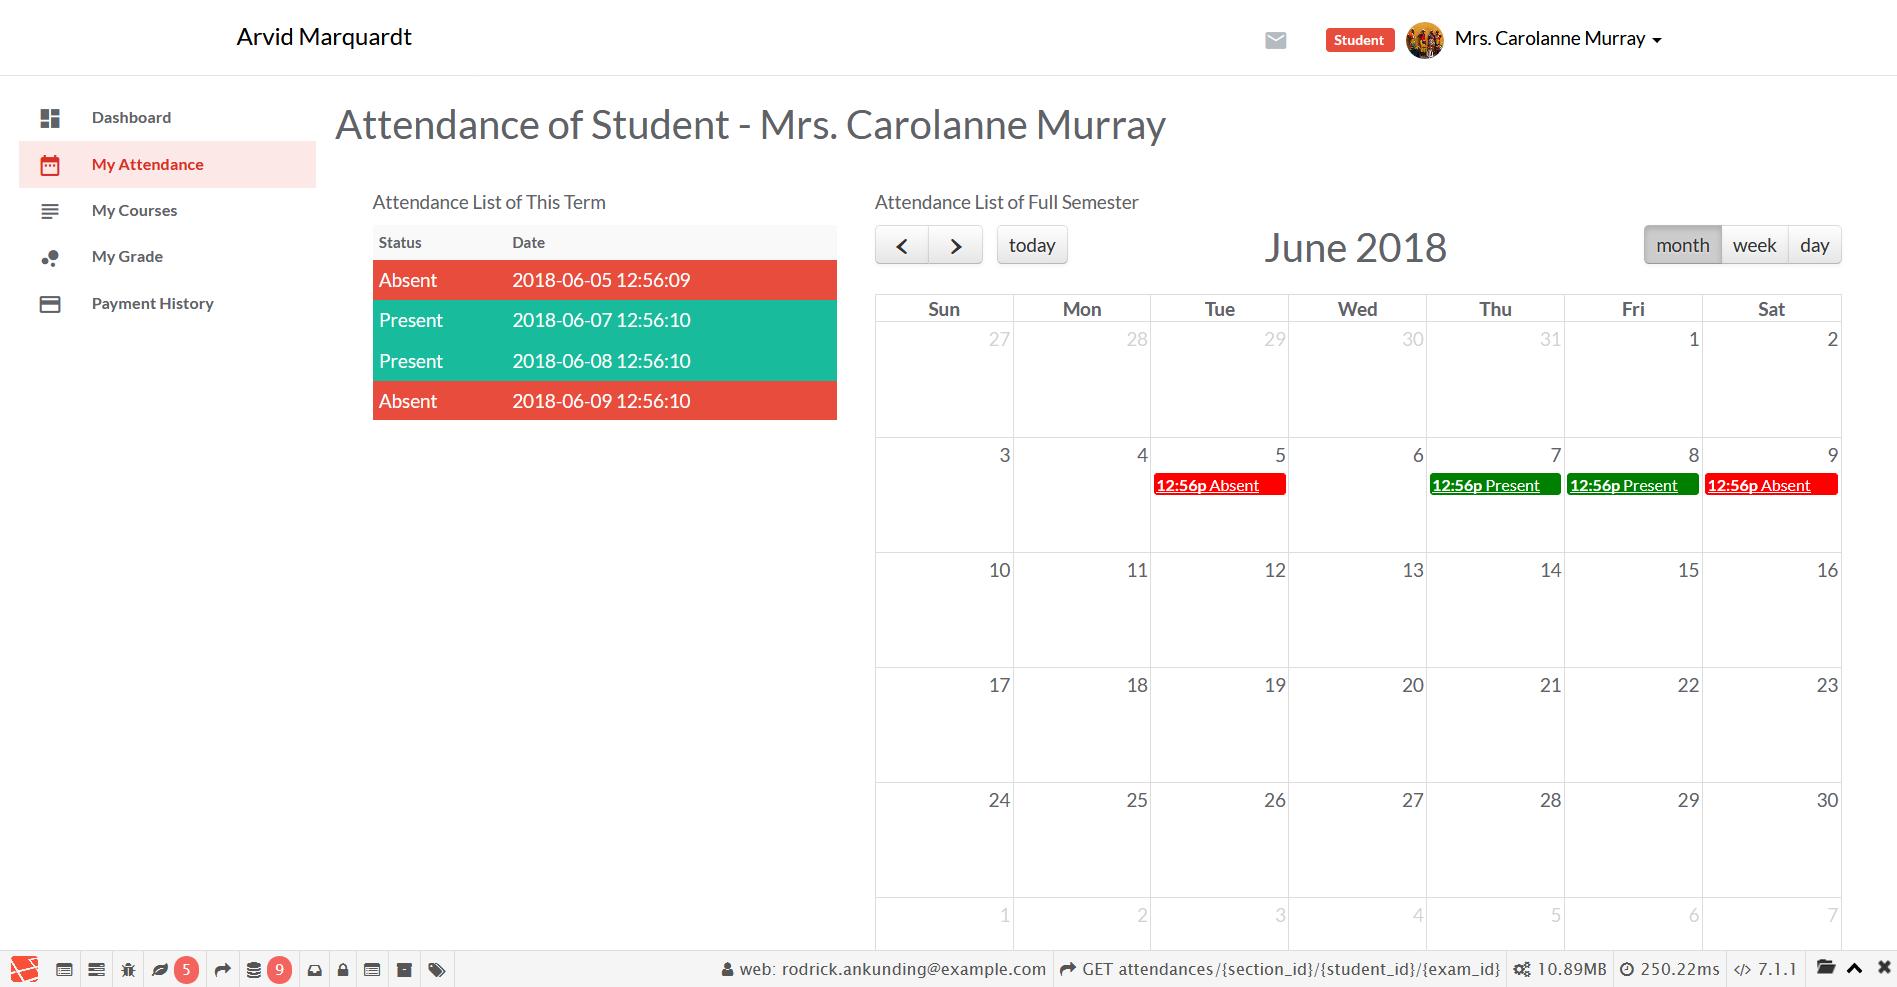 Screenshot_2019-03-12 Attendance - Arvid Marquardt(2)